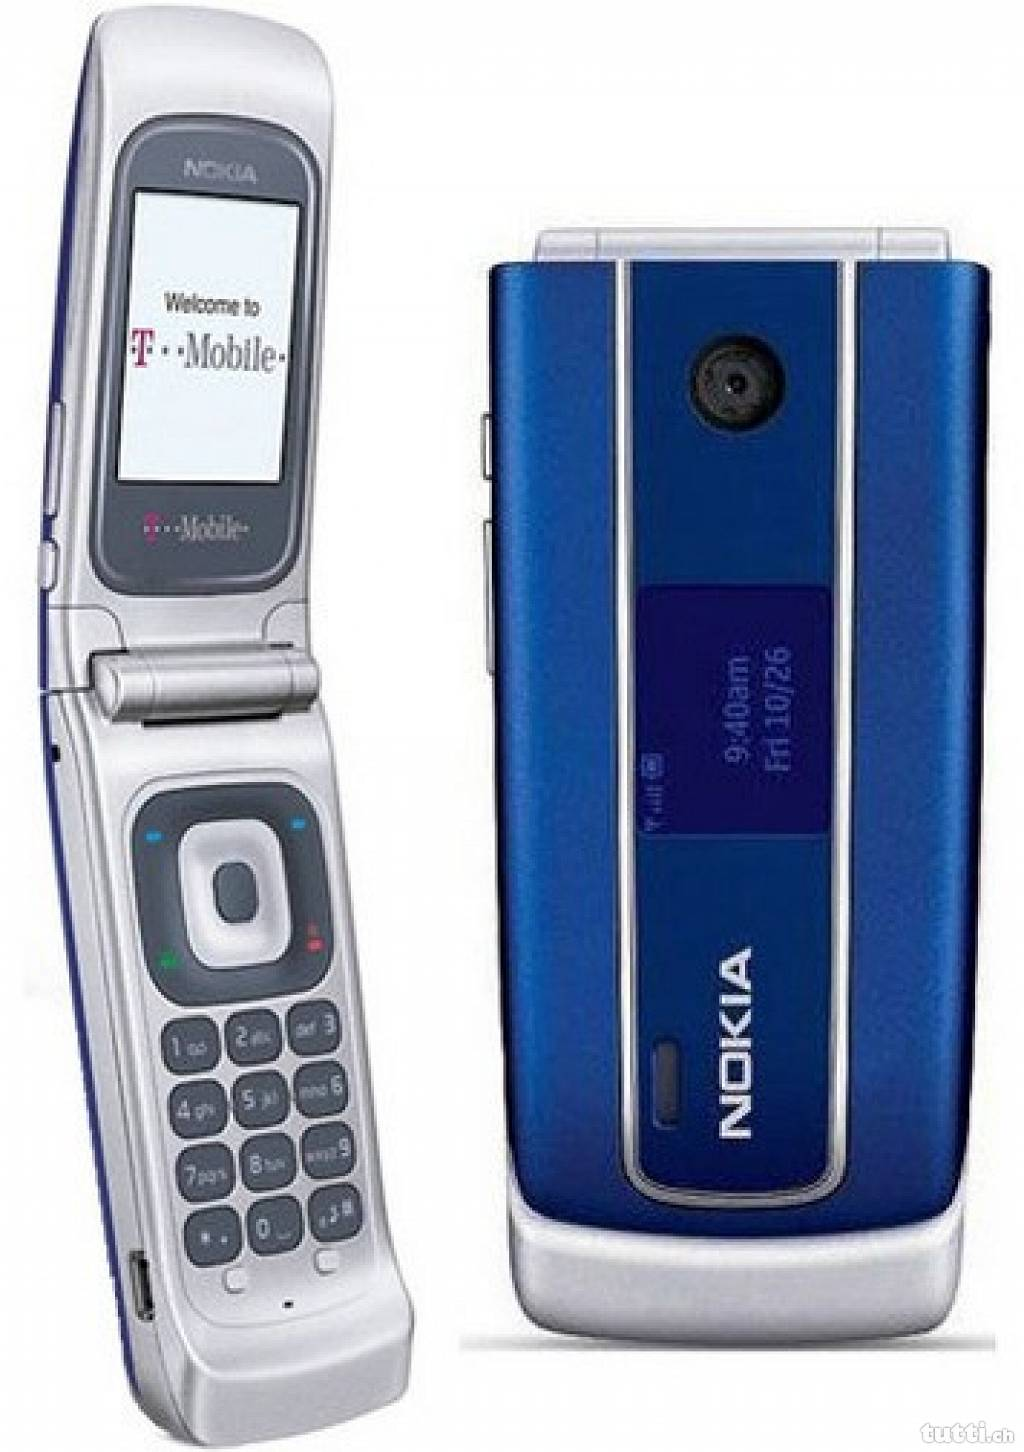 Nokia 3555 Image